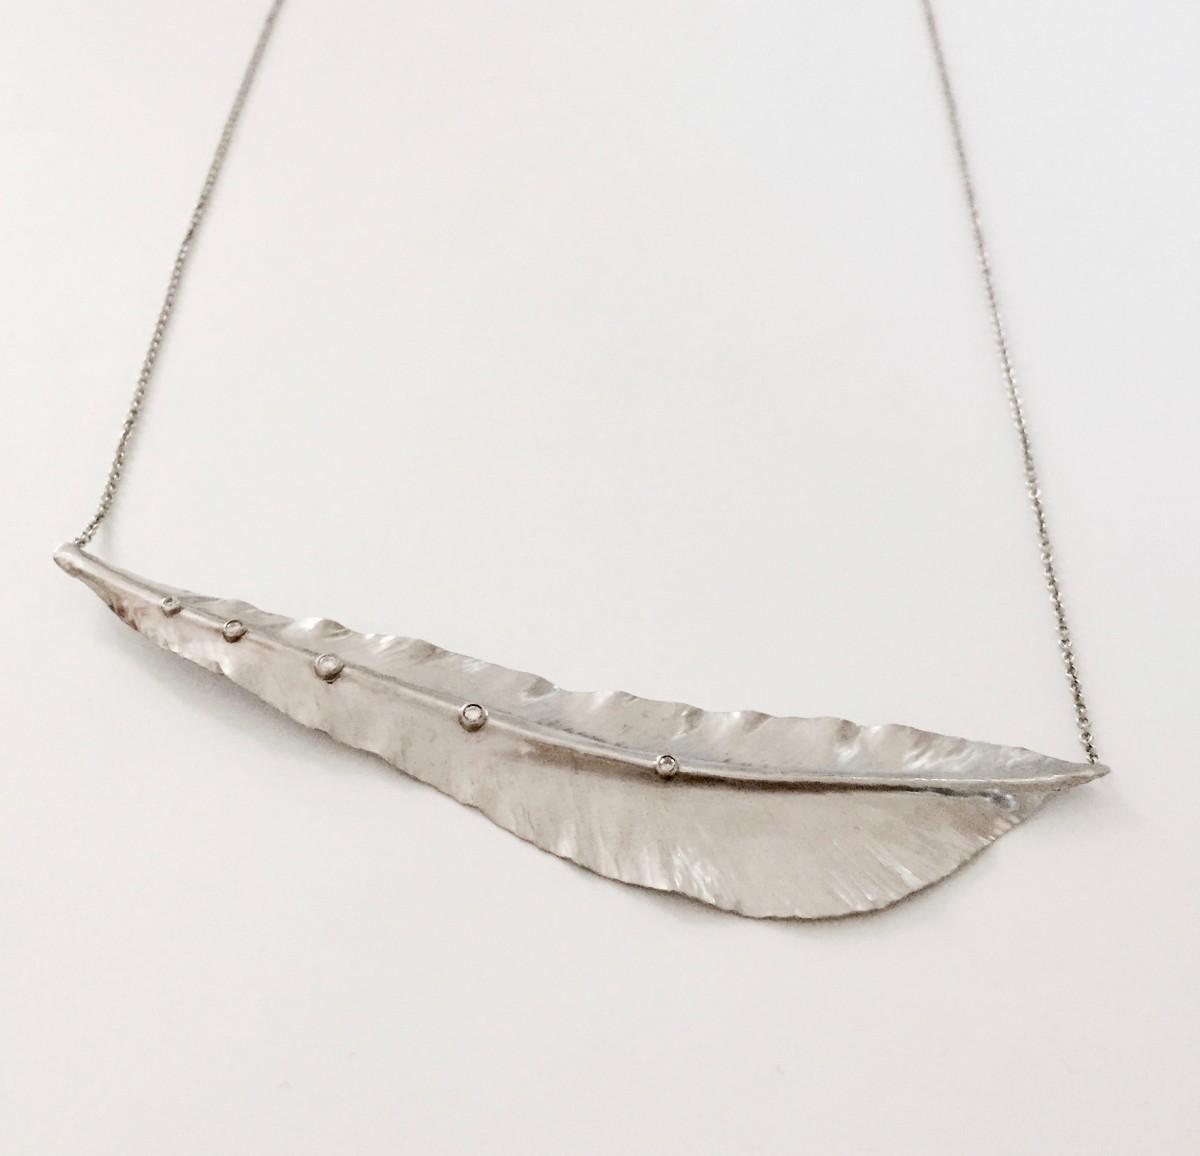 Palladium Feather Bib-Necklace | Alexandra Hart Jewelry